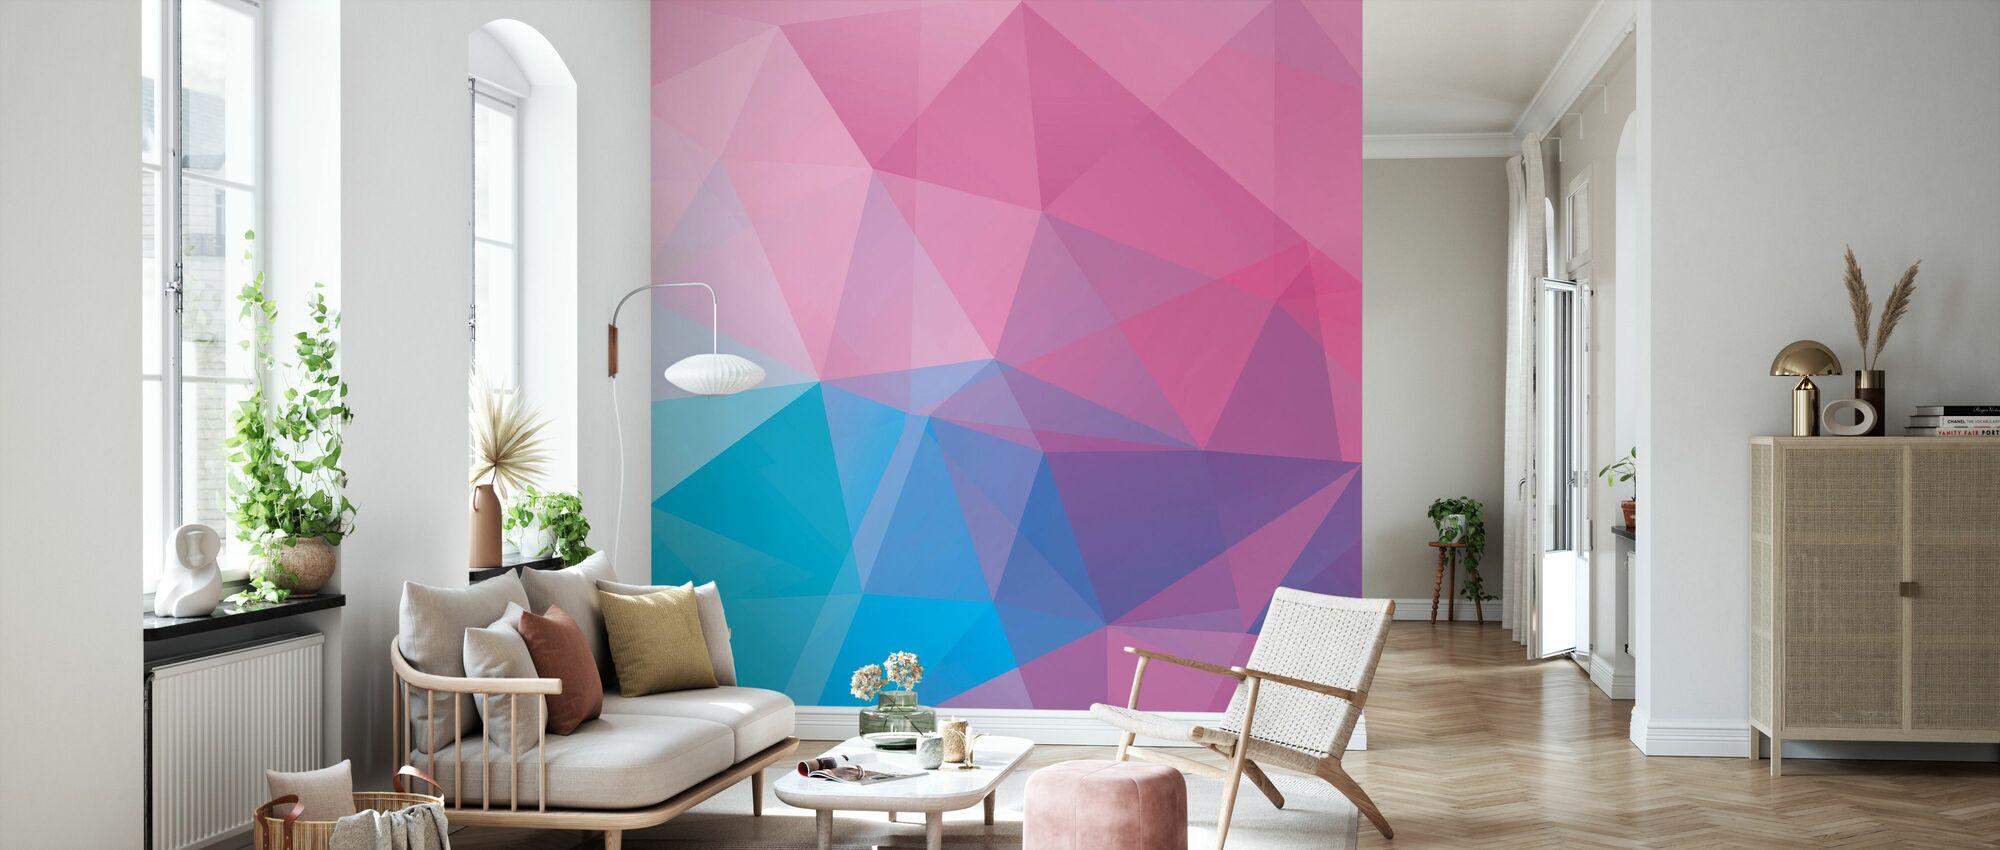 Polygonal Pastels - Wallpaper - Living Room